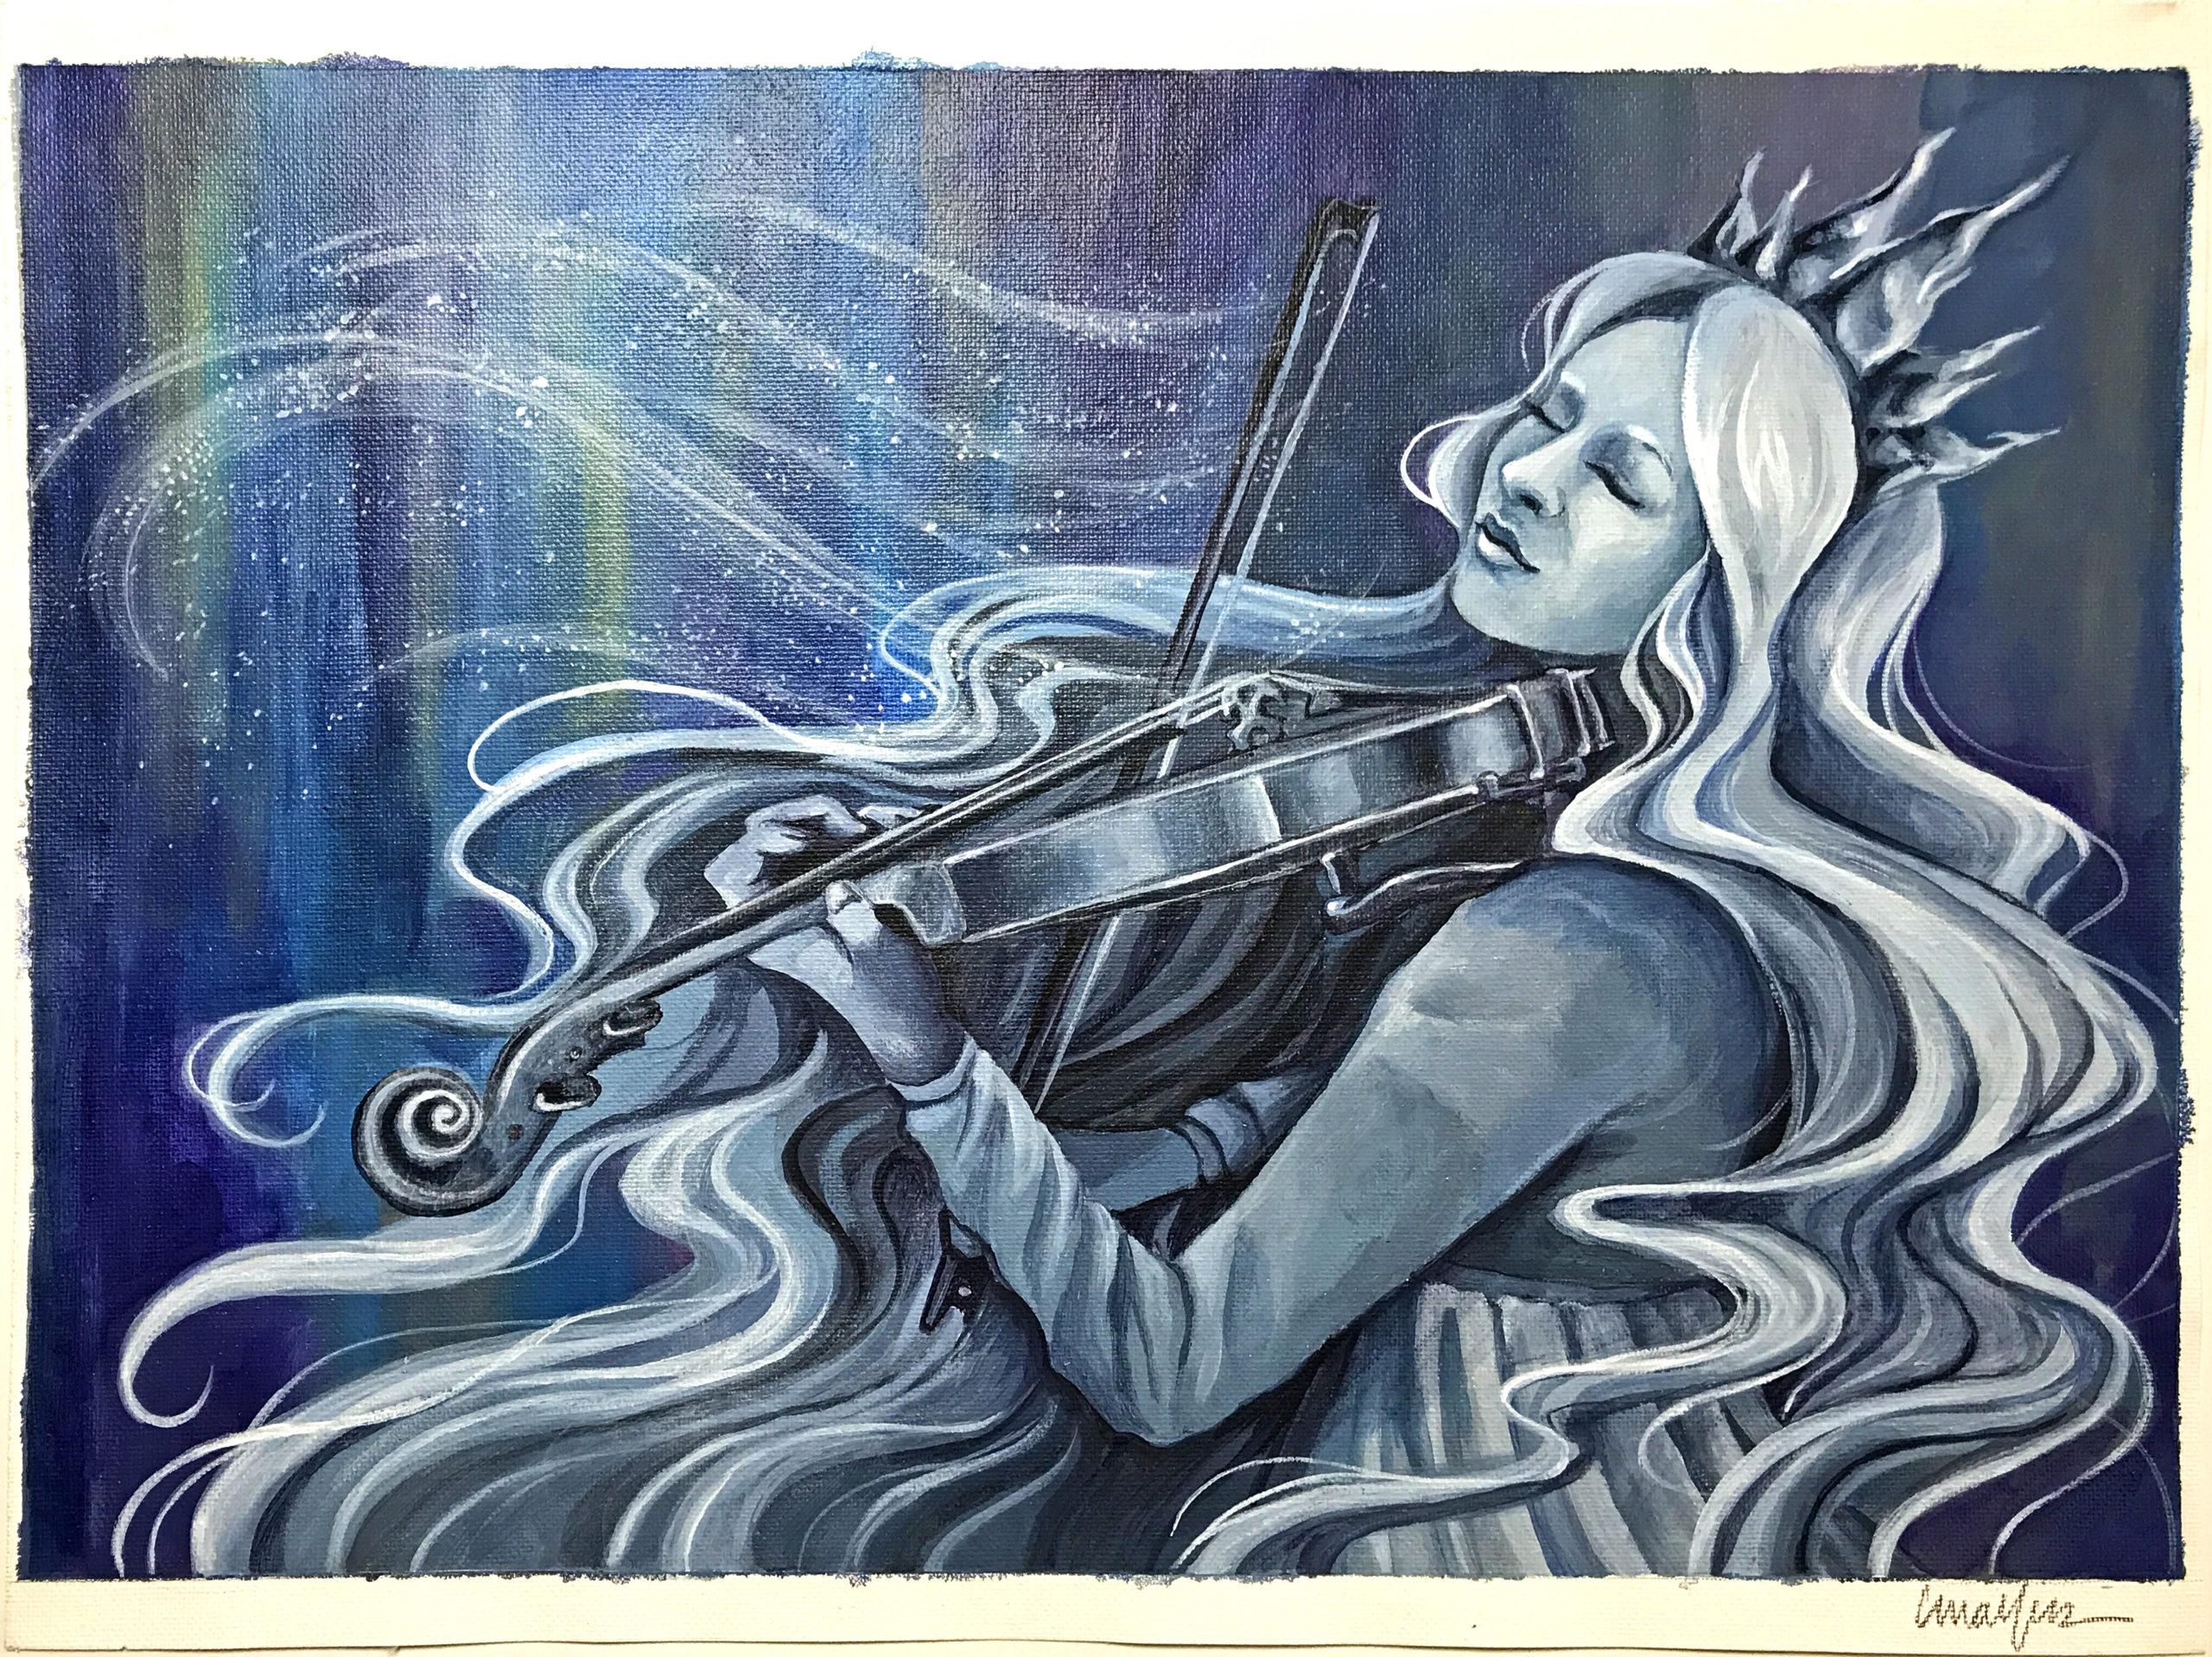 Vivaldi Four Seasons student artwork from MassArt, Christina Malfas